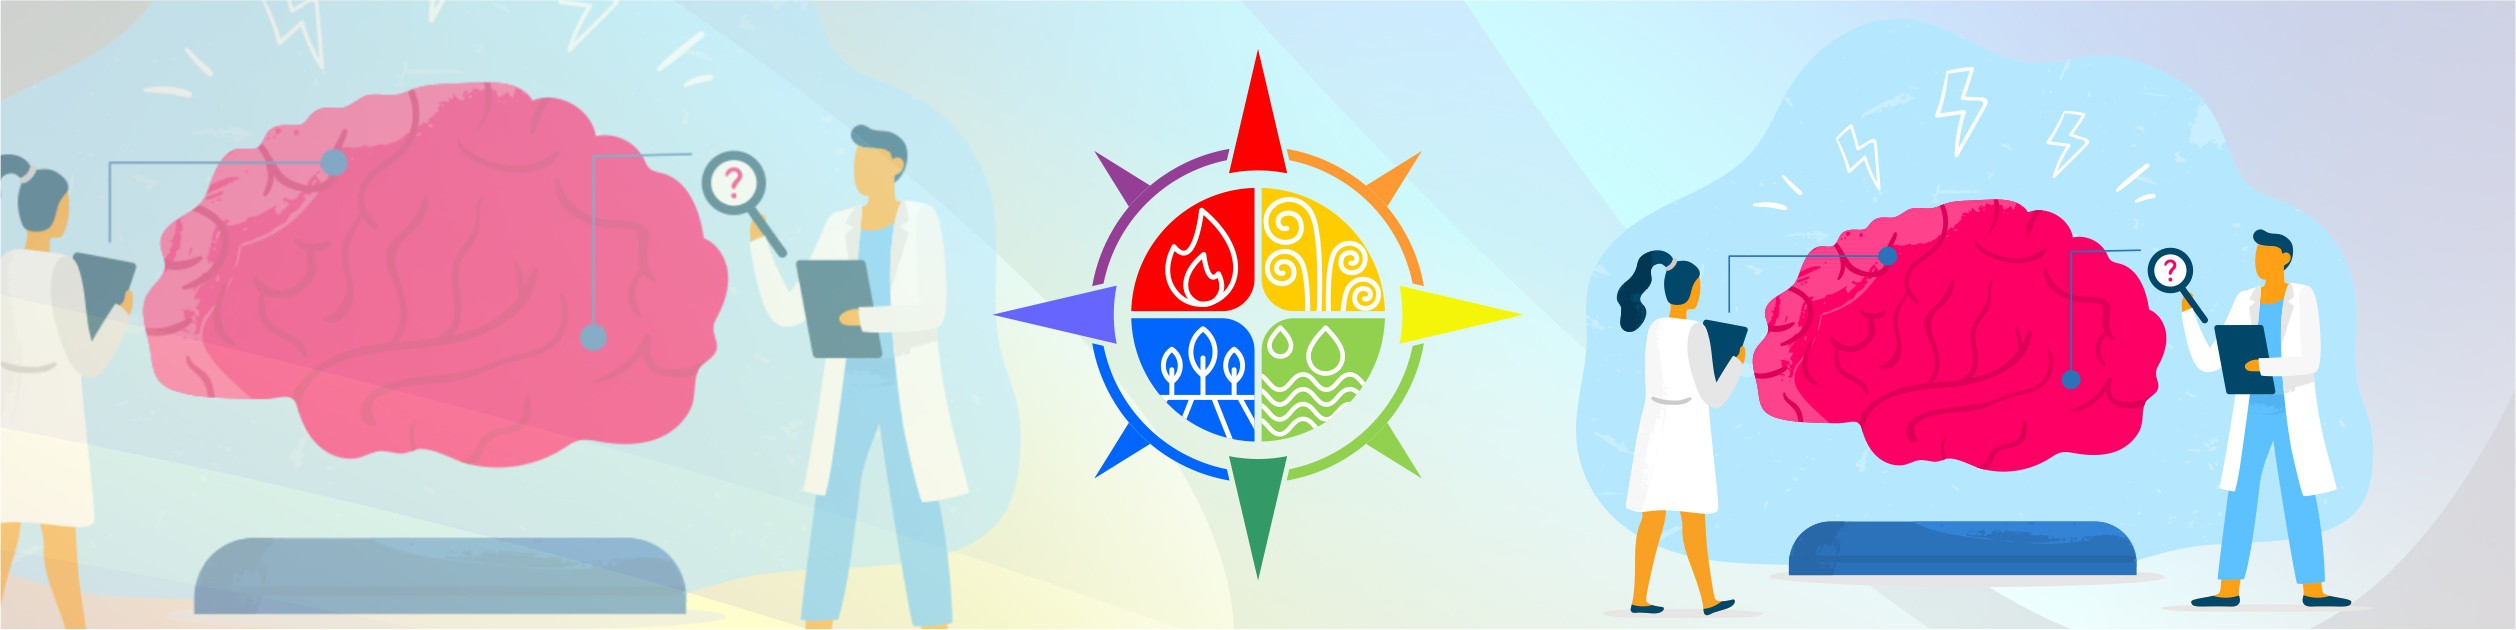 Social media banner design for PersonalCompass